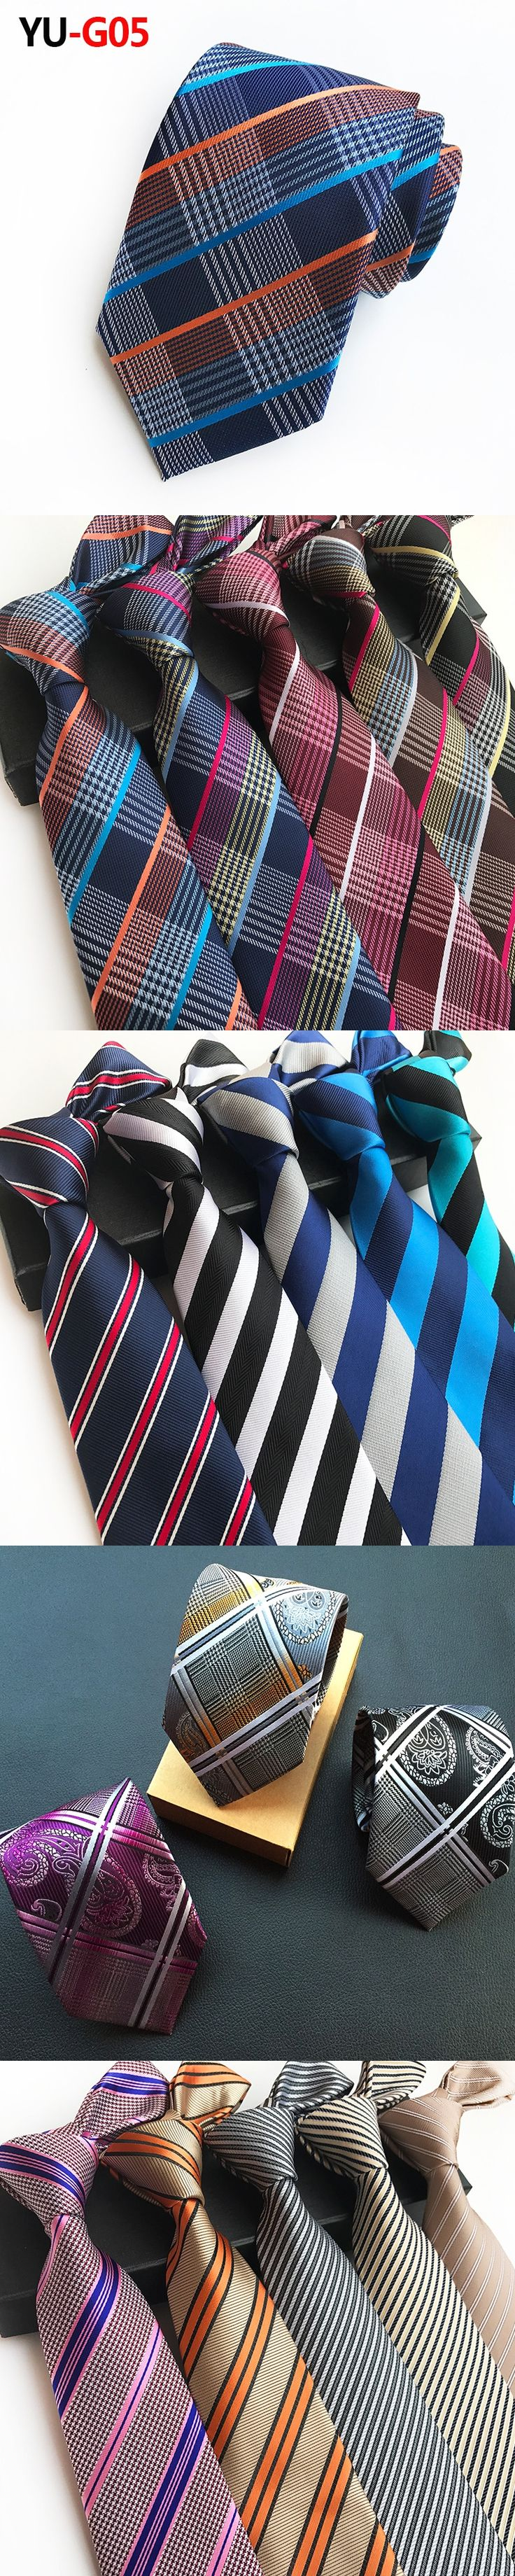 Mens Ties Silk New Design Plaid Triped Jacquard Woven Necktie Ties for Men Wedding Dress Formal Business Tie Slim Gravata 8cm